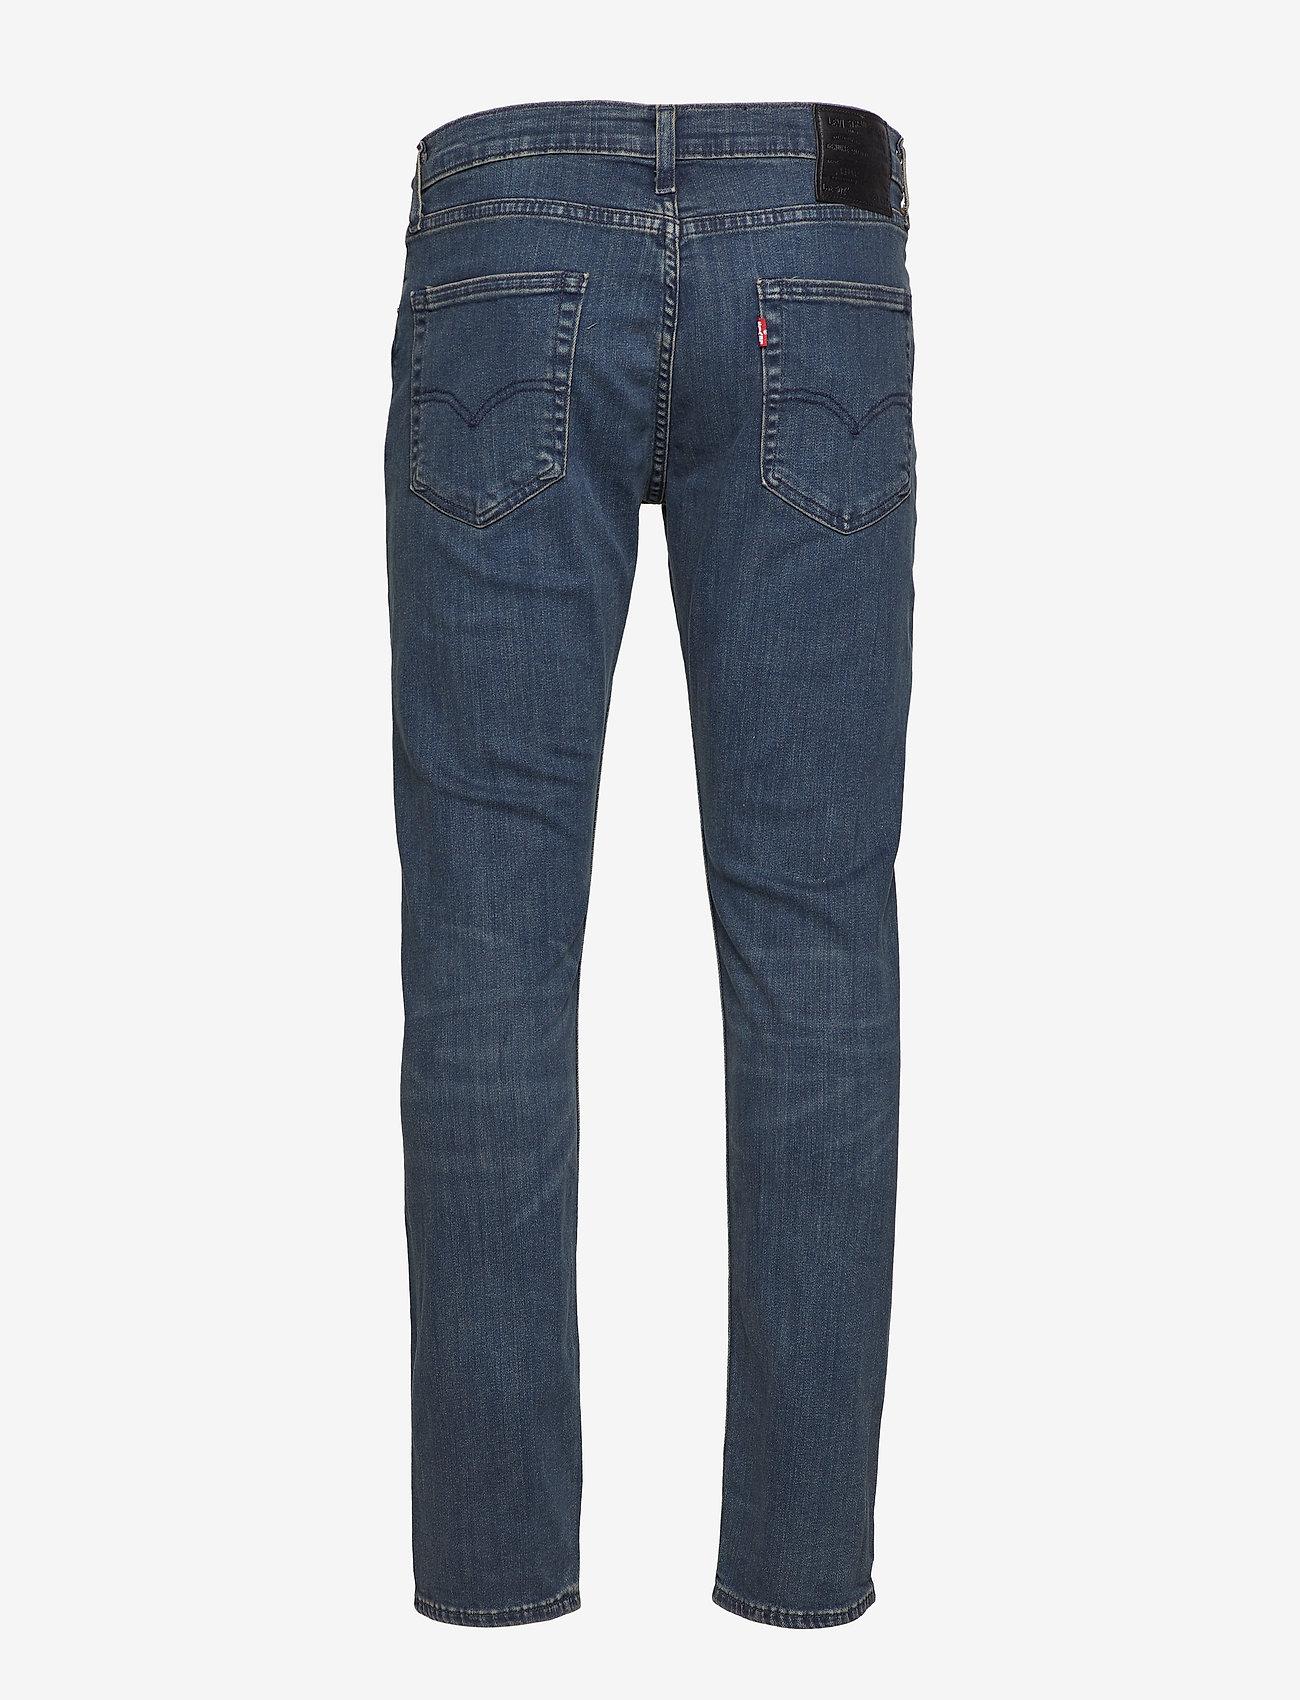 LEVI´S Men - 502 REGULAR TAPER HEADED SOUTH - slim jeans - dark indigo - worn in - 1